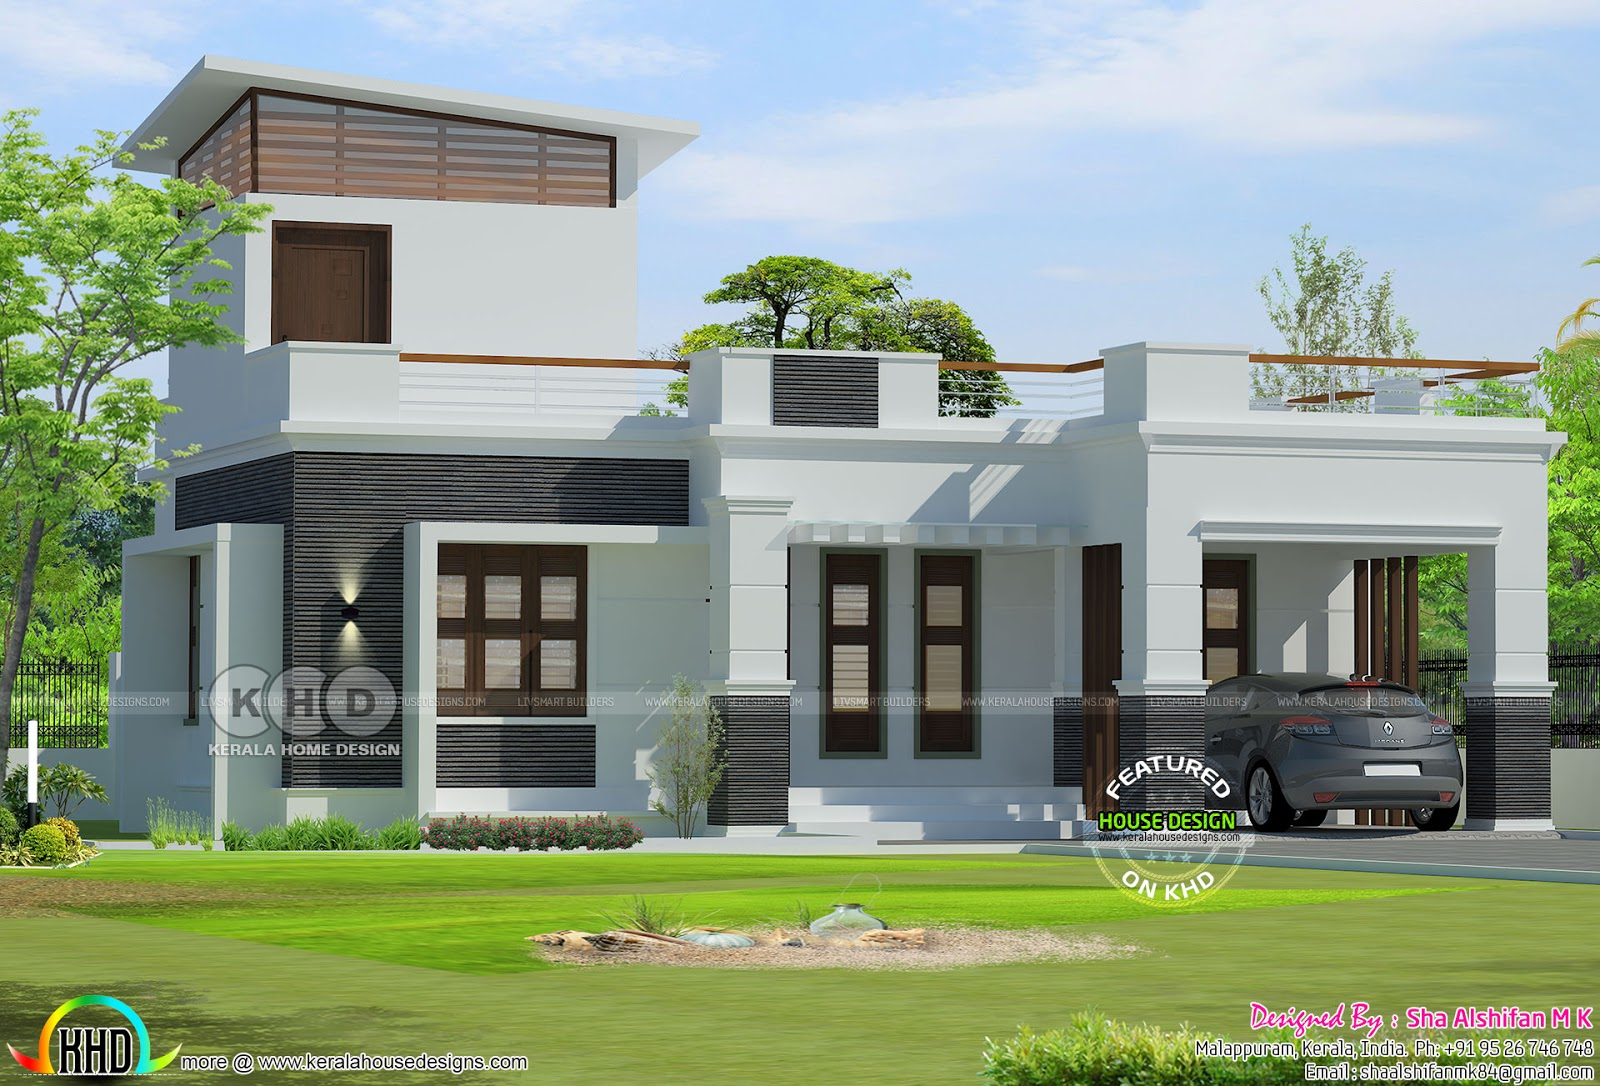 One Floor 2 Bedroom 1300 Square Feet Kerala Home Kerala Home Design Bloglovin